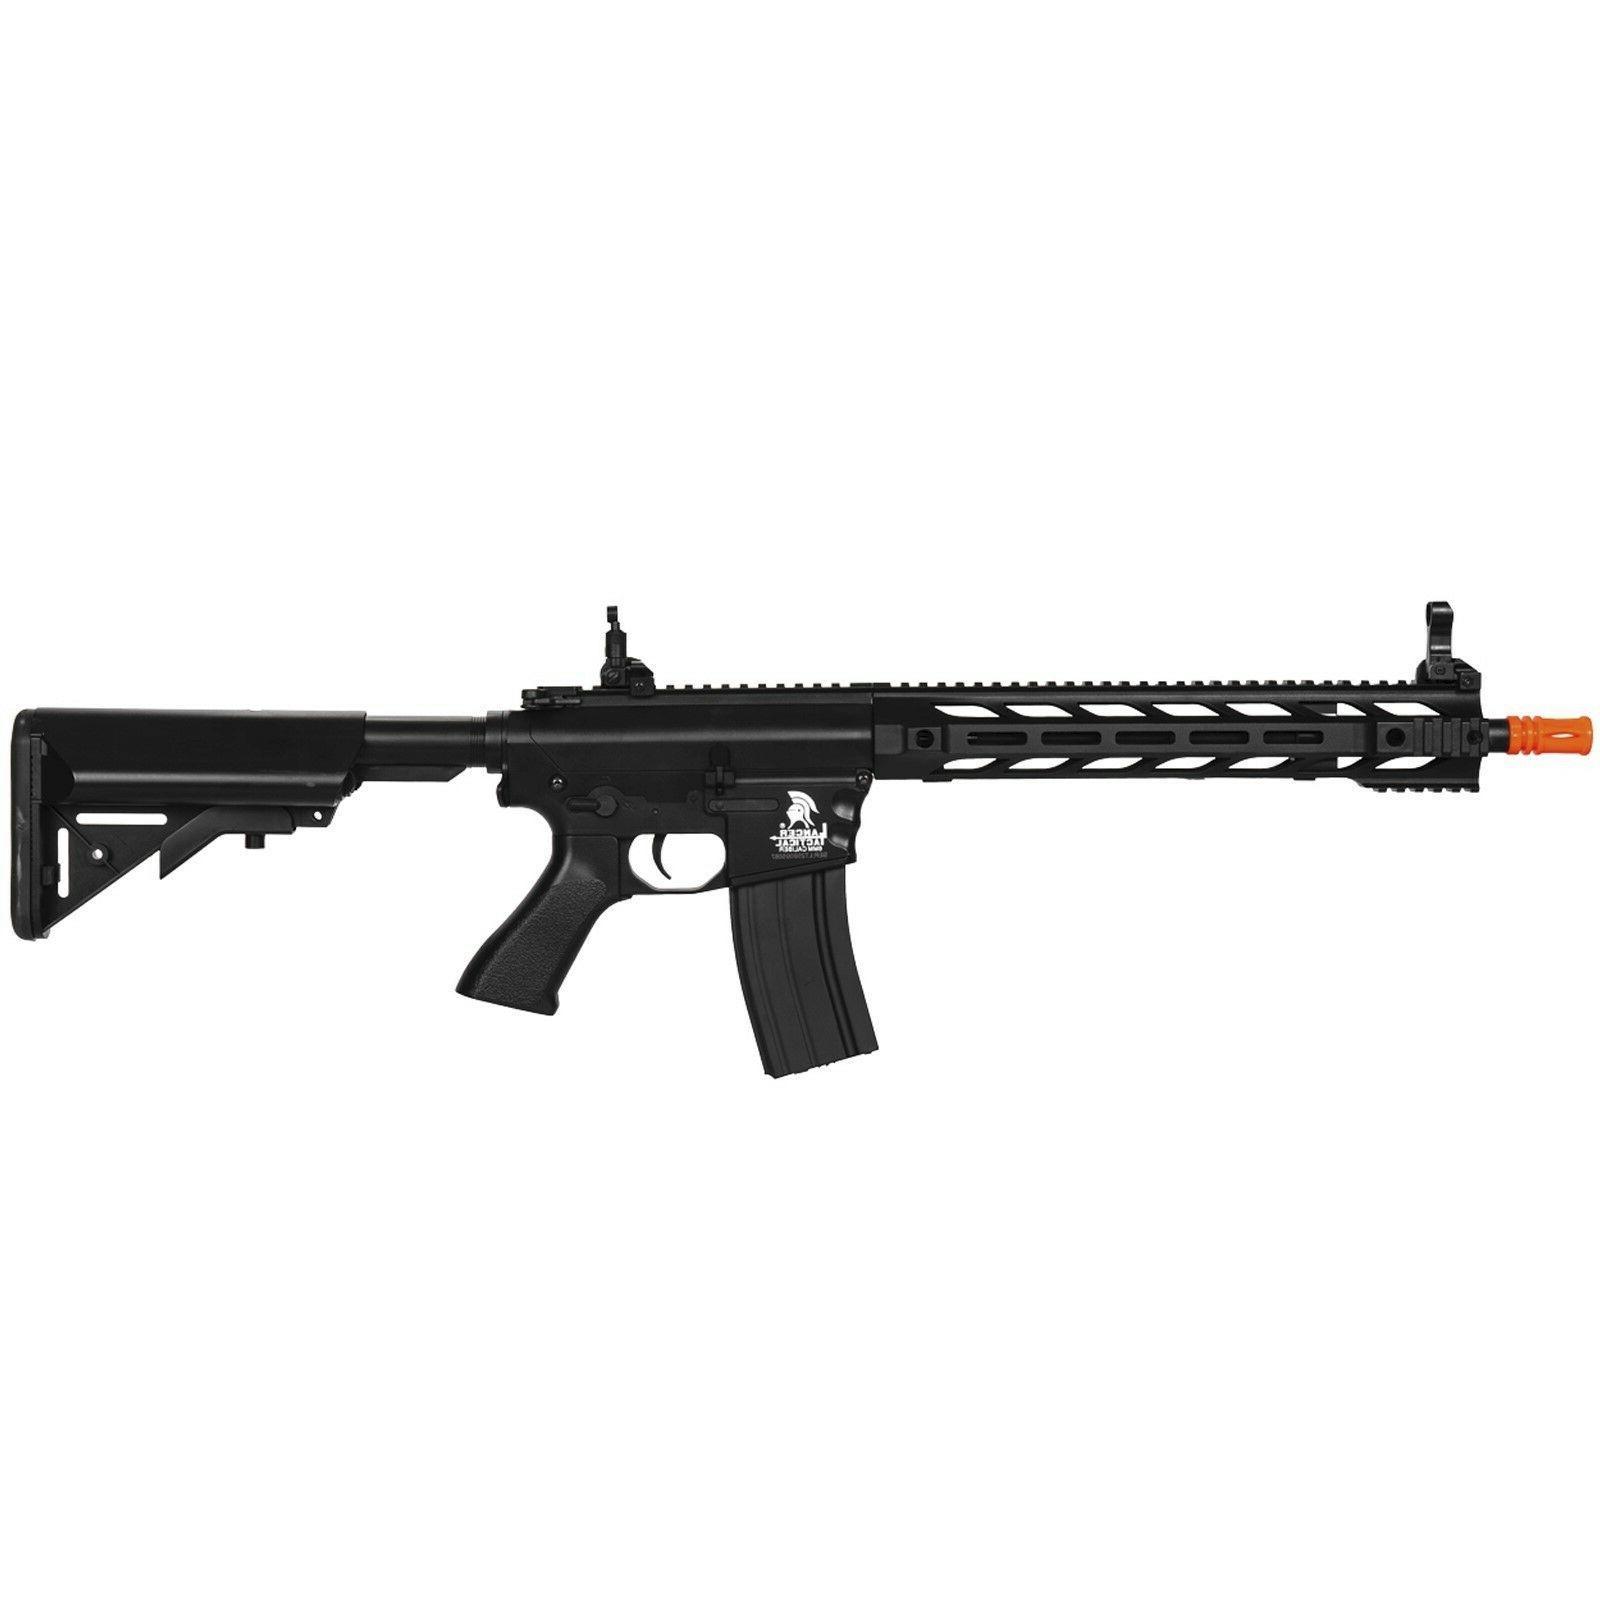 Lancer LT-25 SPR M4 Electric Airsoft Rifle